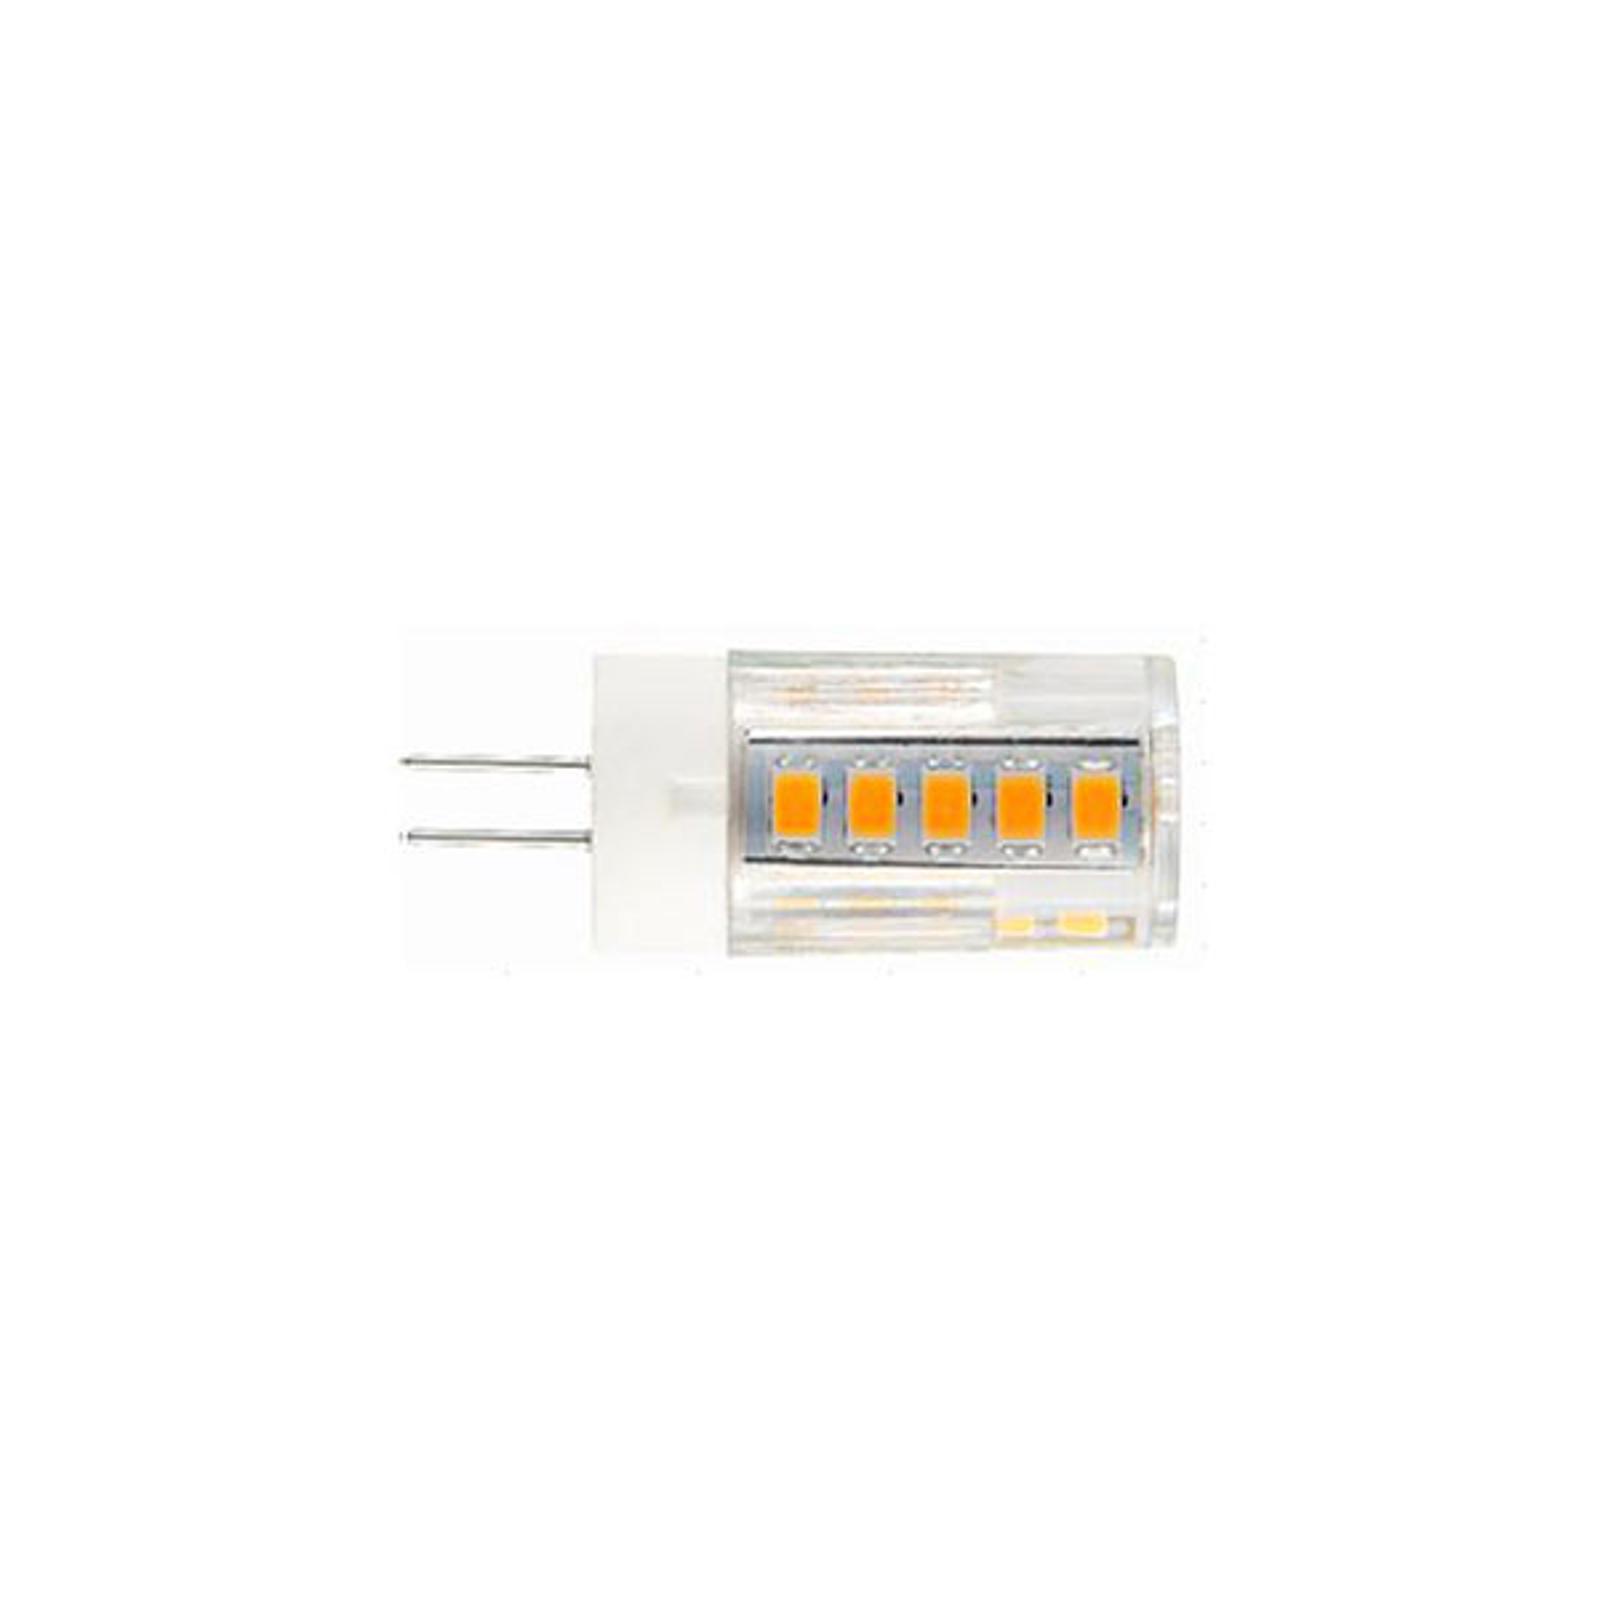 LED attacco G4 2,5 W bianco caldo 250 Lumen